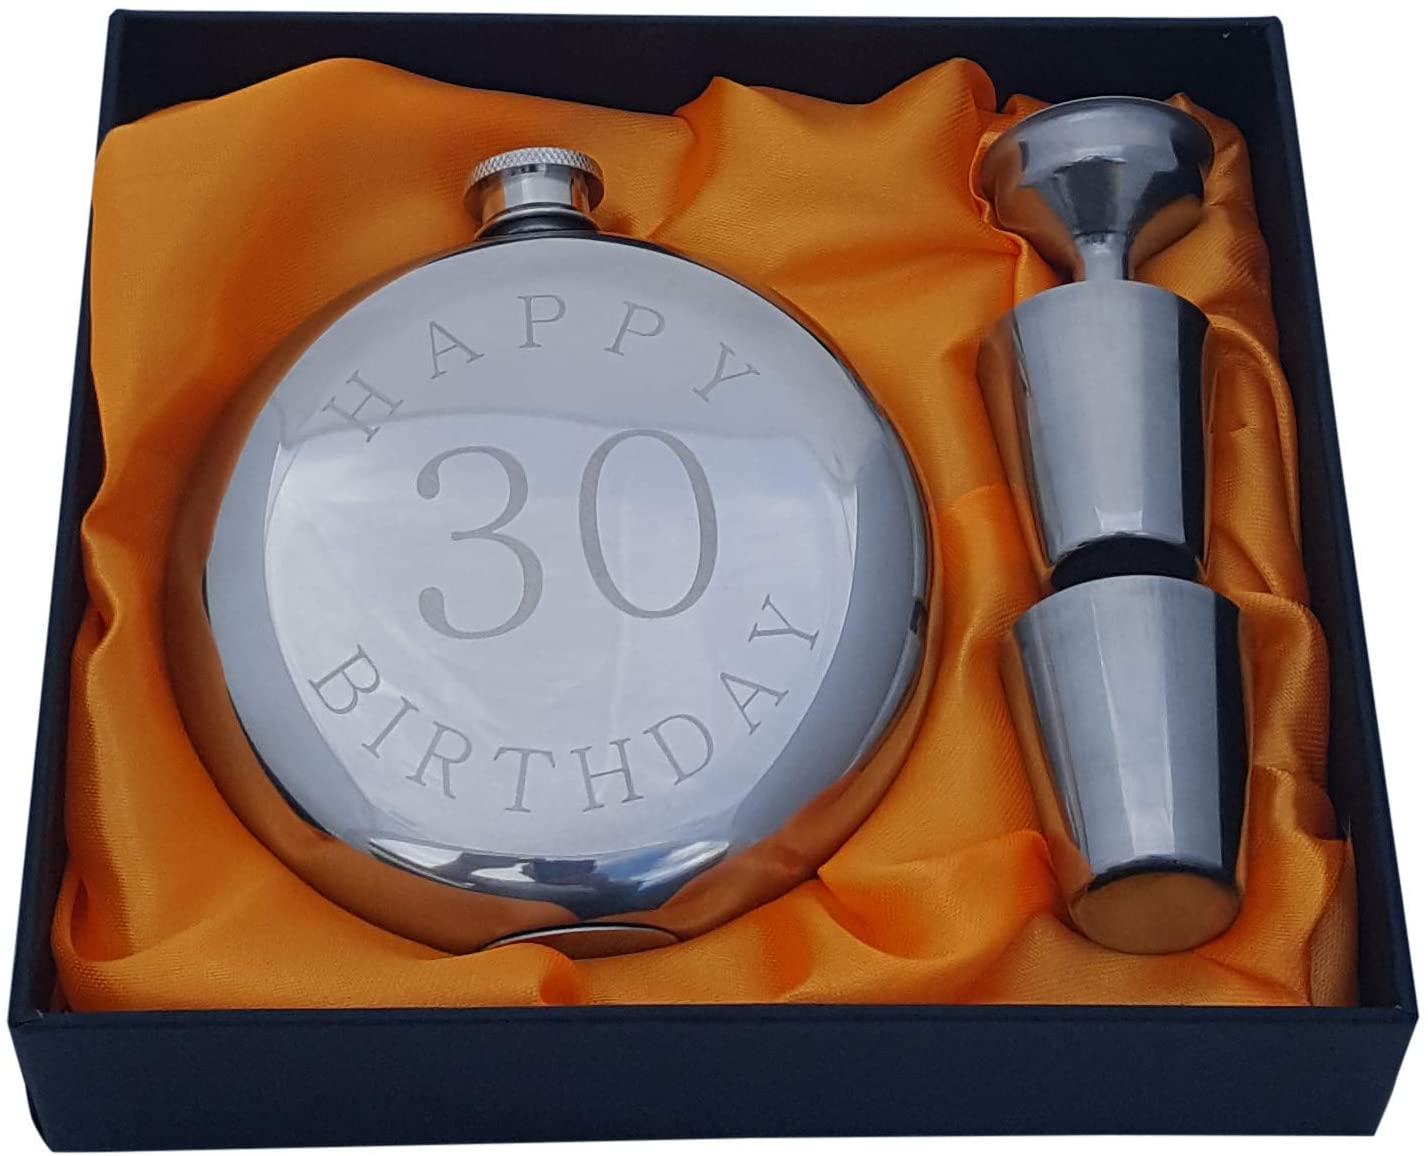 6. Happy 30th Birthday Flask Gift Set